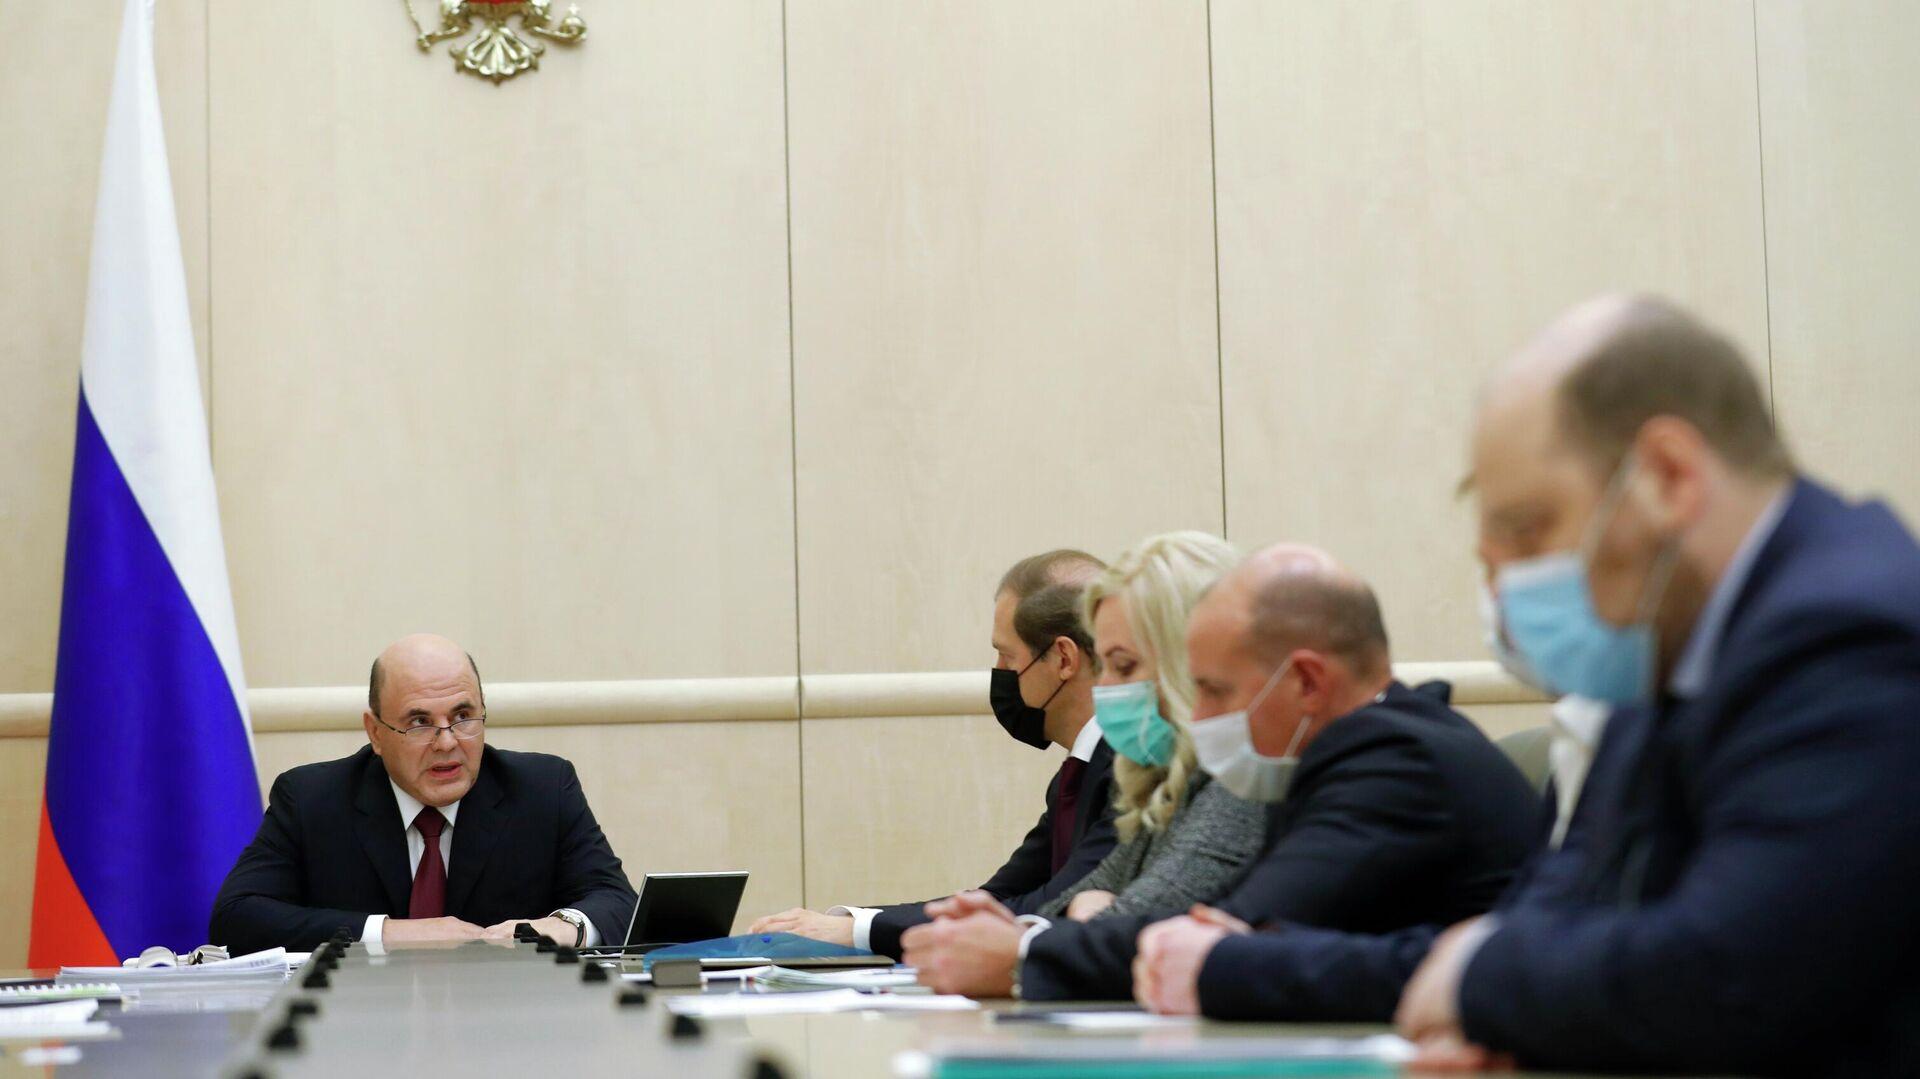 Председатель правительства РФ Михаил Мишустин проводит встречу с производителями вакцин от коронавирусной инфекции COVID-19 - РИА Новости, 1920, 24.11.2020